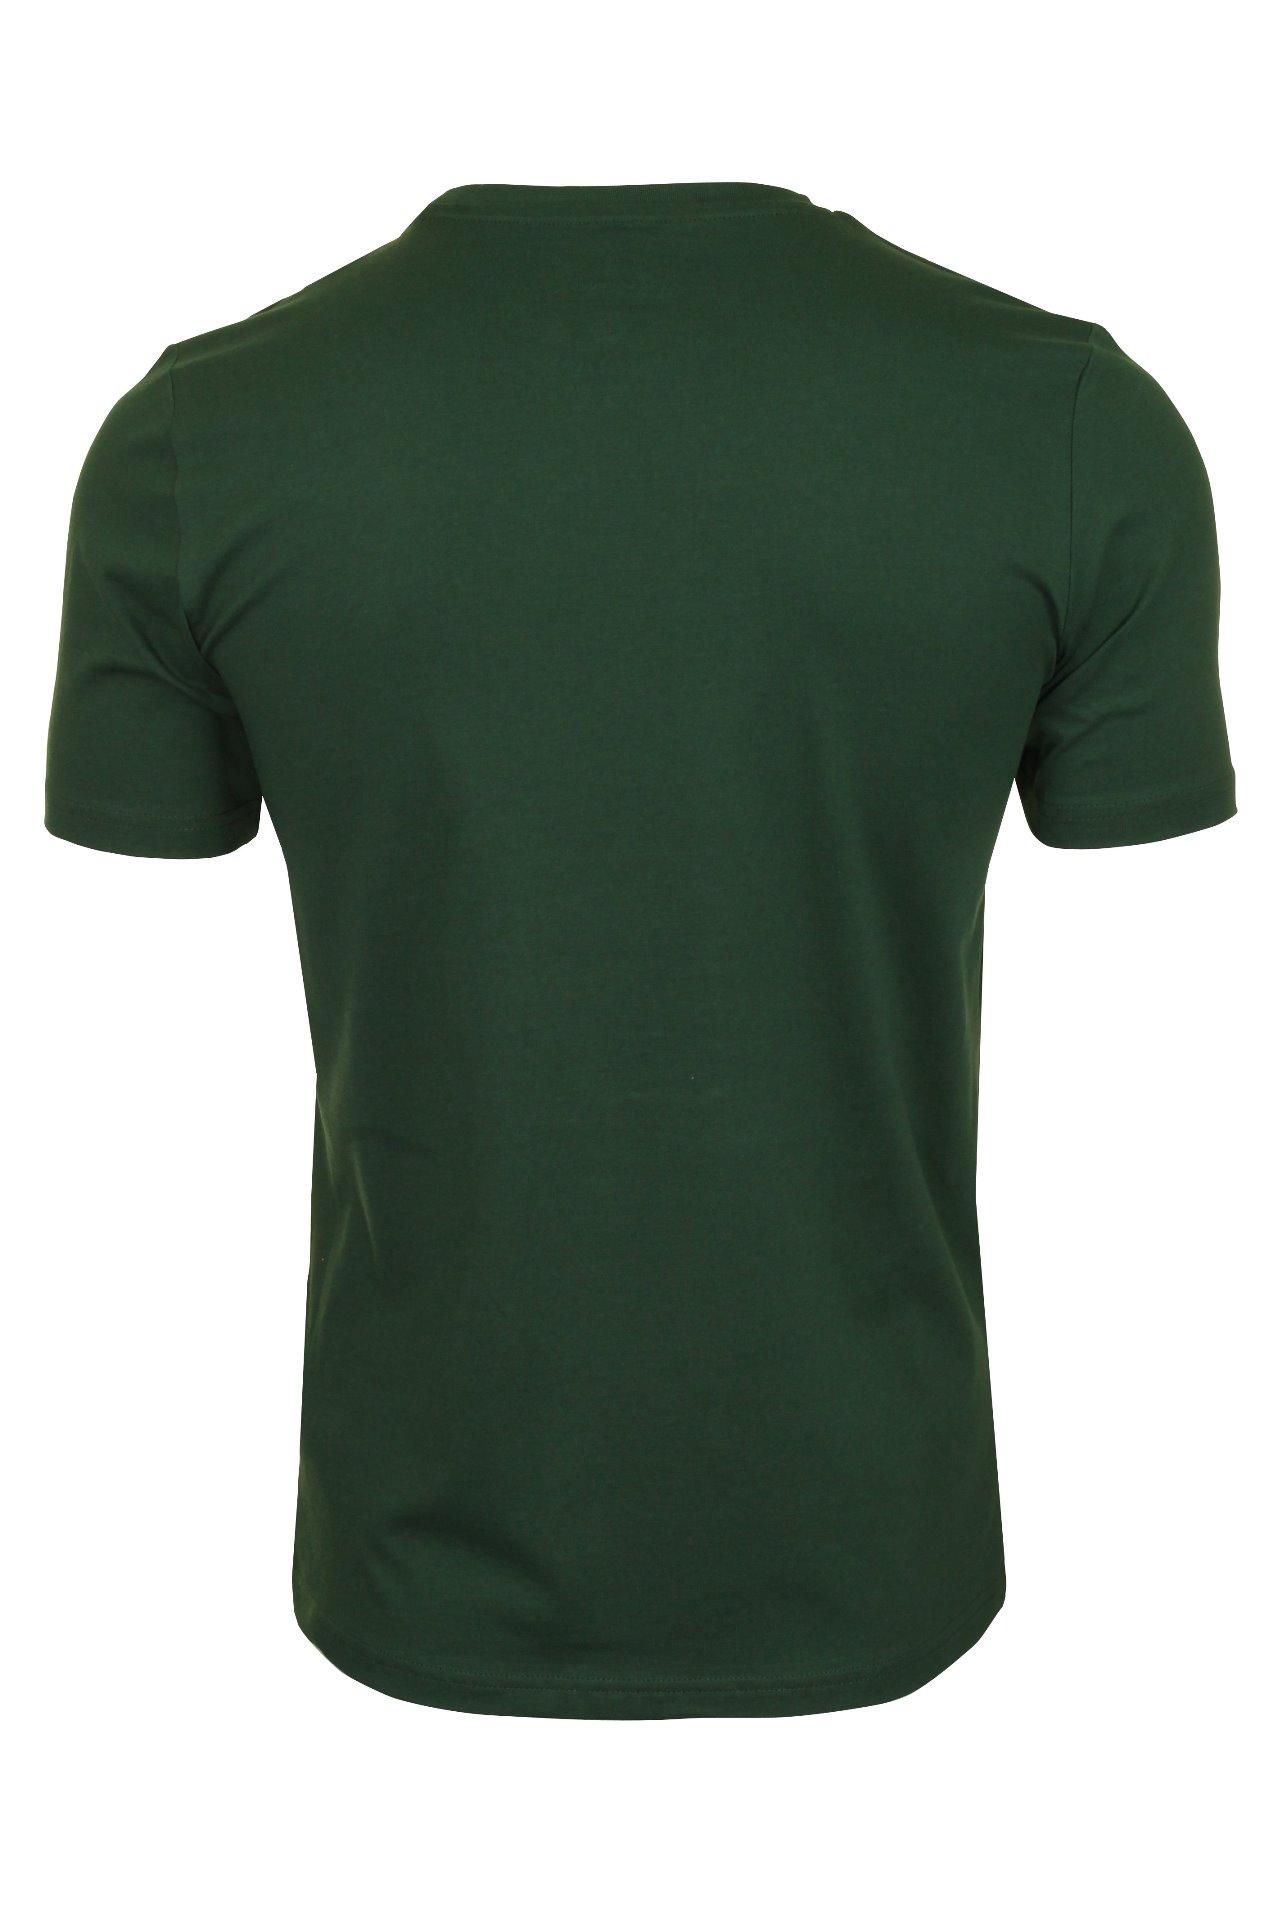 Tokyo-Laundry-Mens-Jersey-Crew-Neck-T-Shirt-039-San-Service-039 thumbnail 8